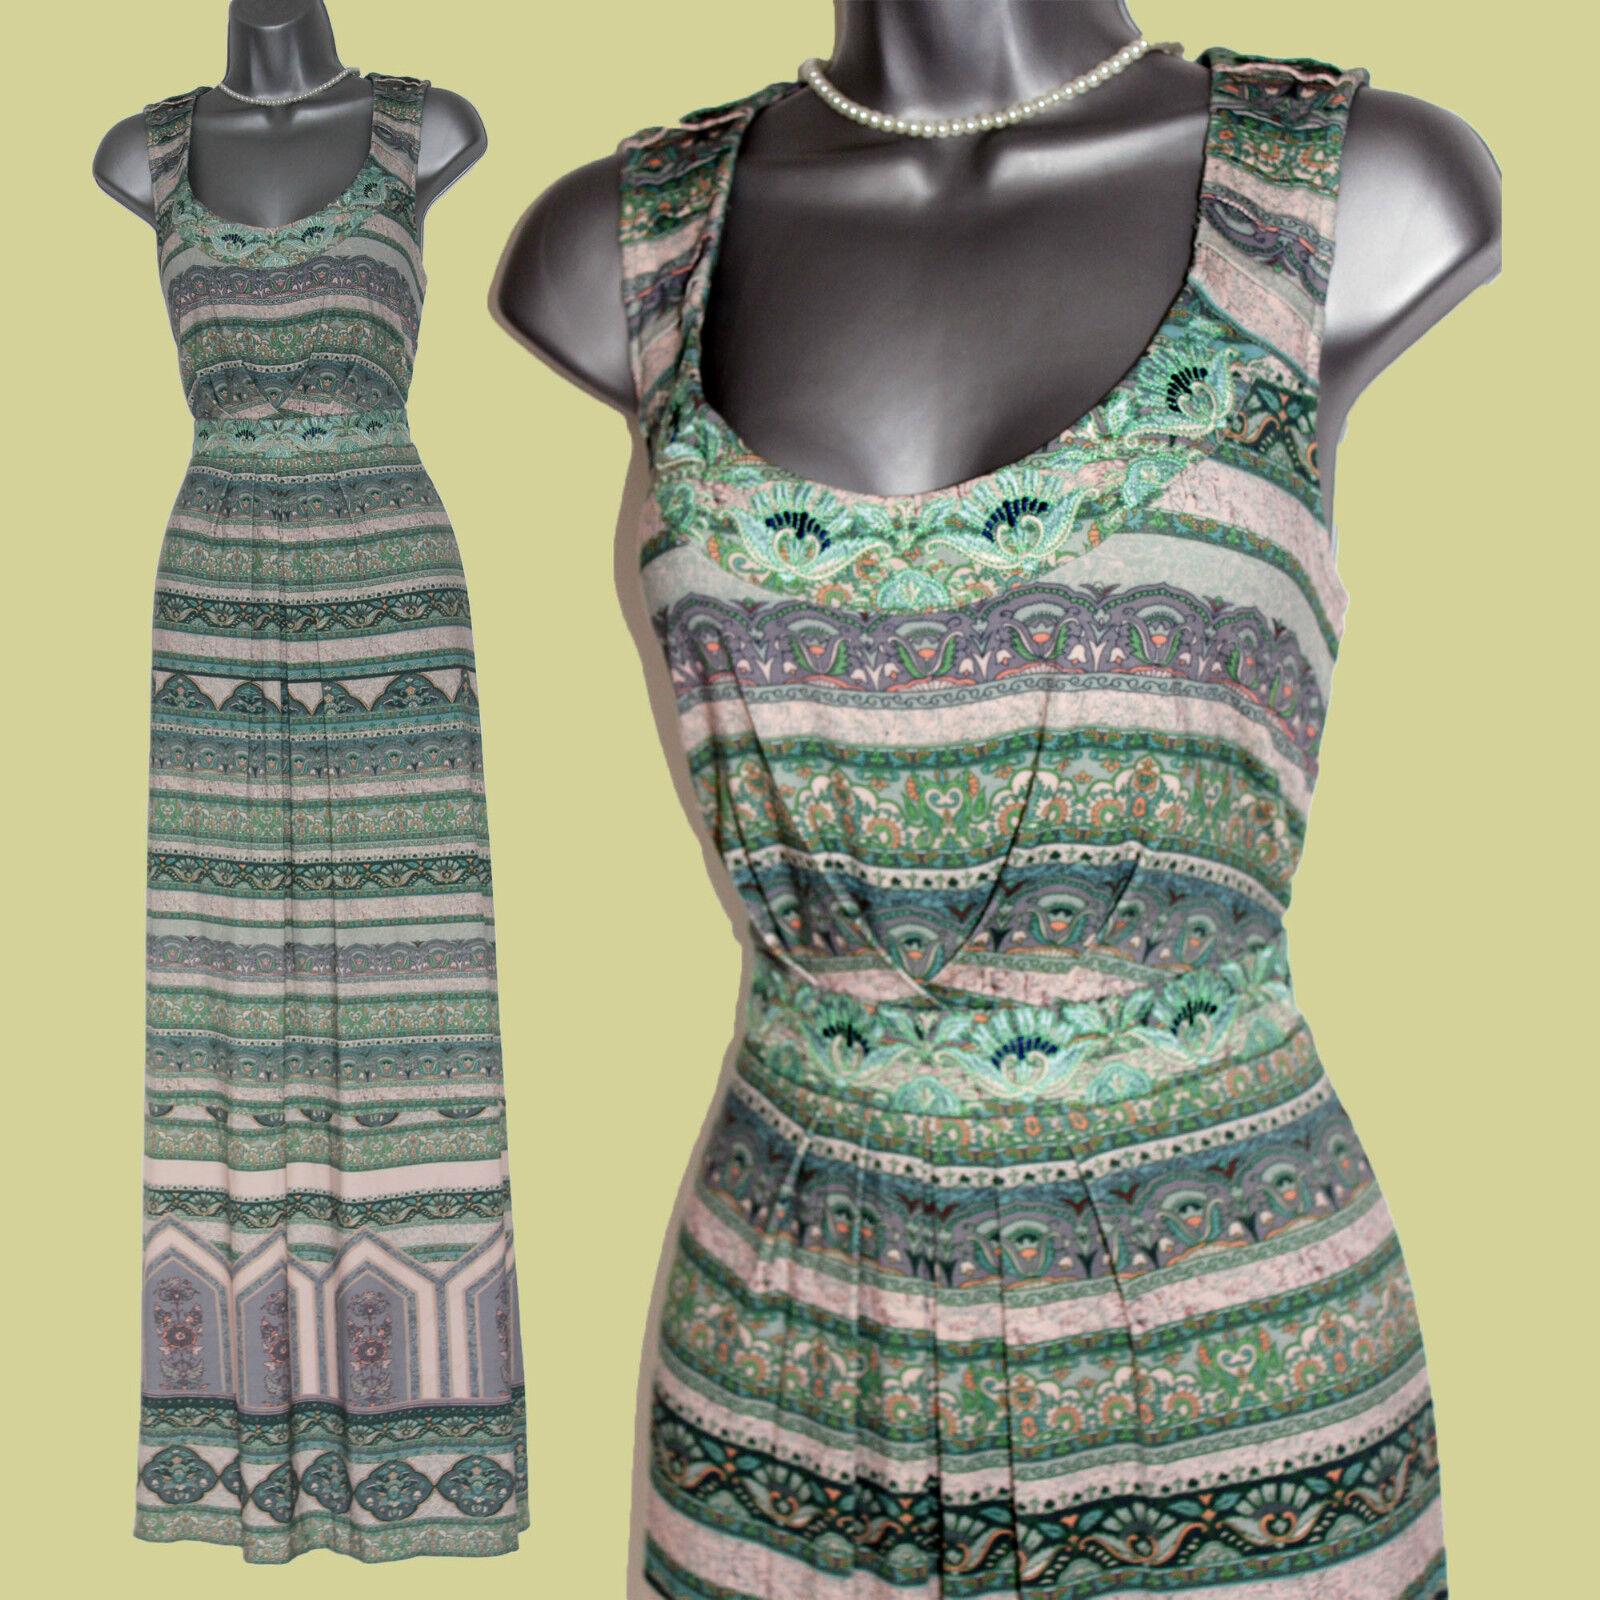 MONSOON Grün Print Embroiderot Neck Waist Casual Party Maxi Dress  UK12  EU40